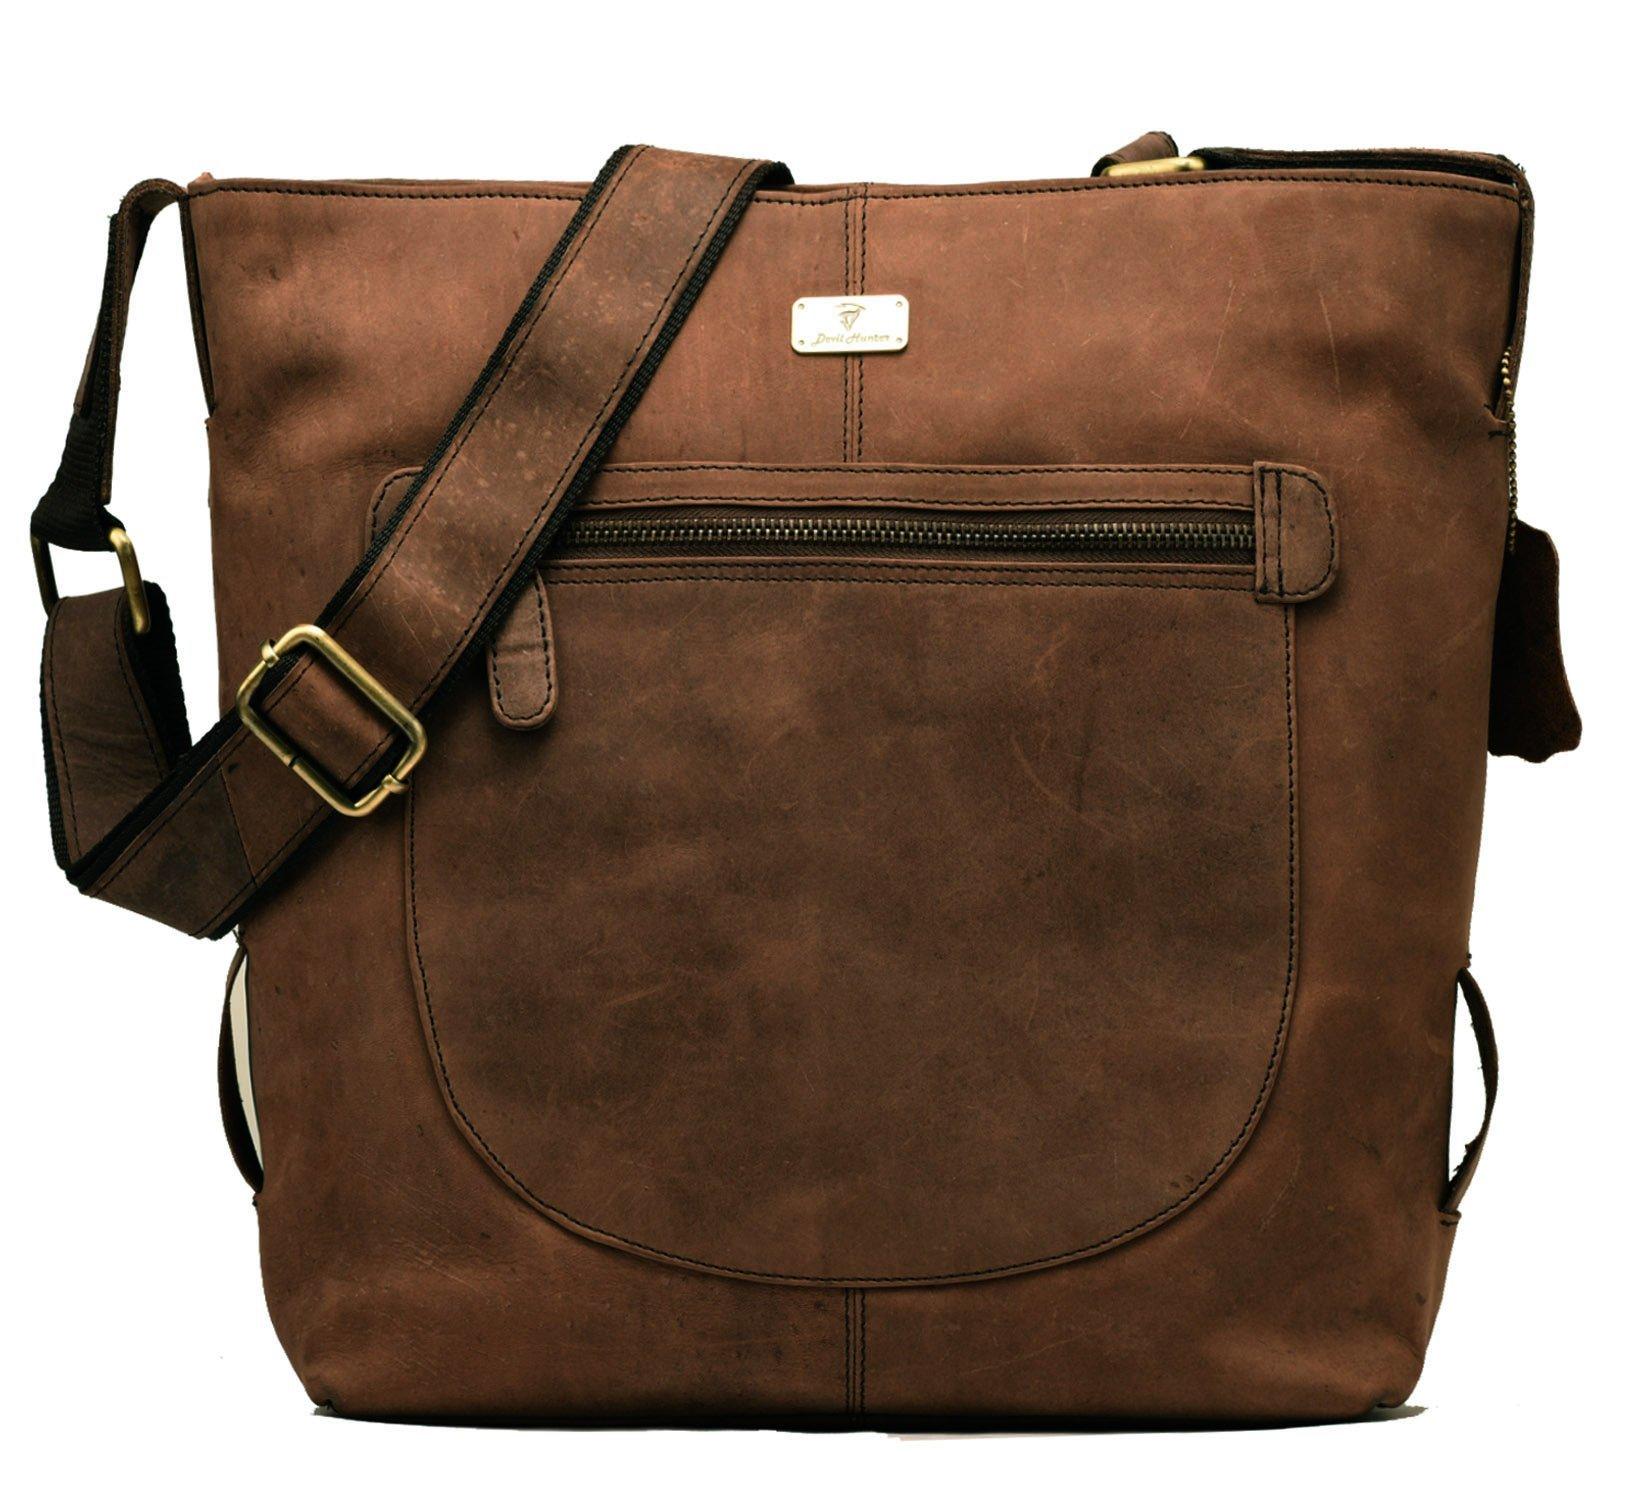 DH Monaco genuine buffalo leather shopper bag in vintage style - Nutmeg